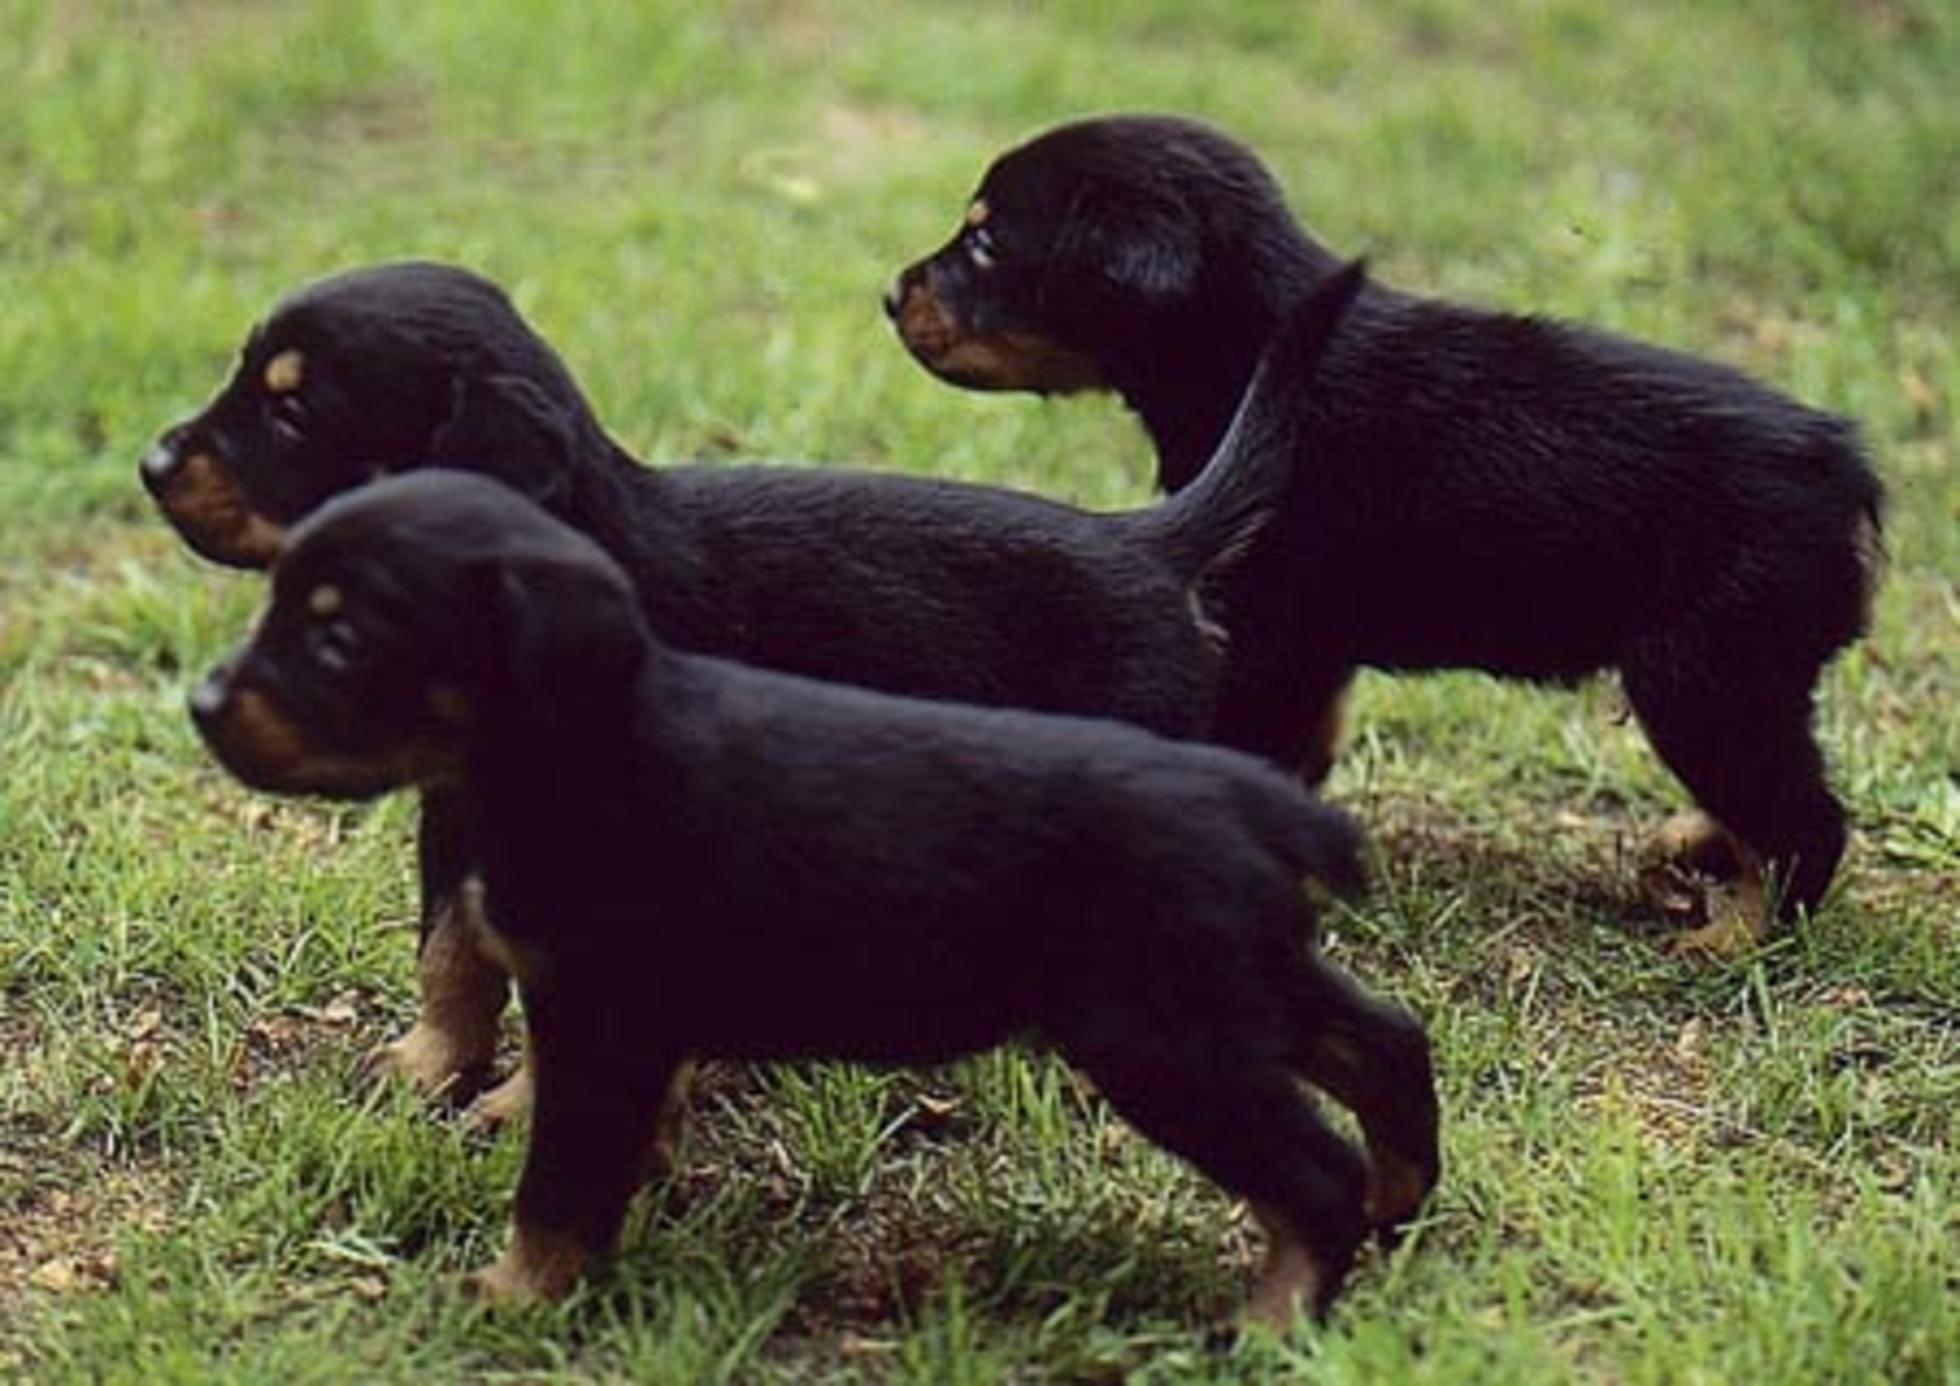 Saint-Usuge Spaniel Puppies: Saint Usuge Smalandsstovare Puppies Breed